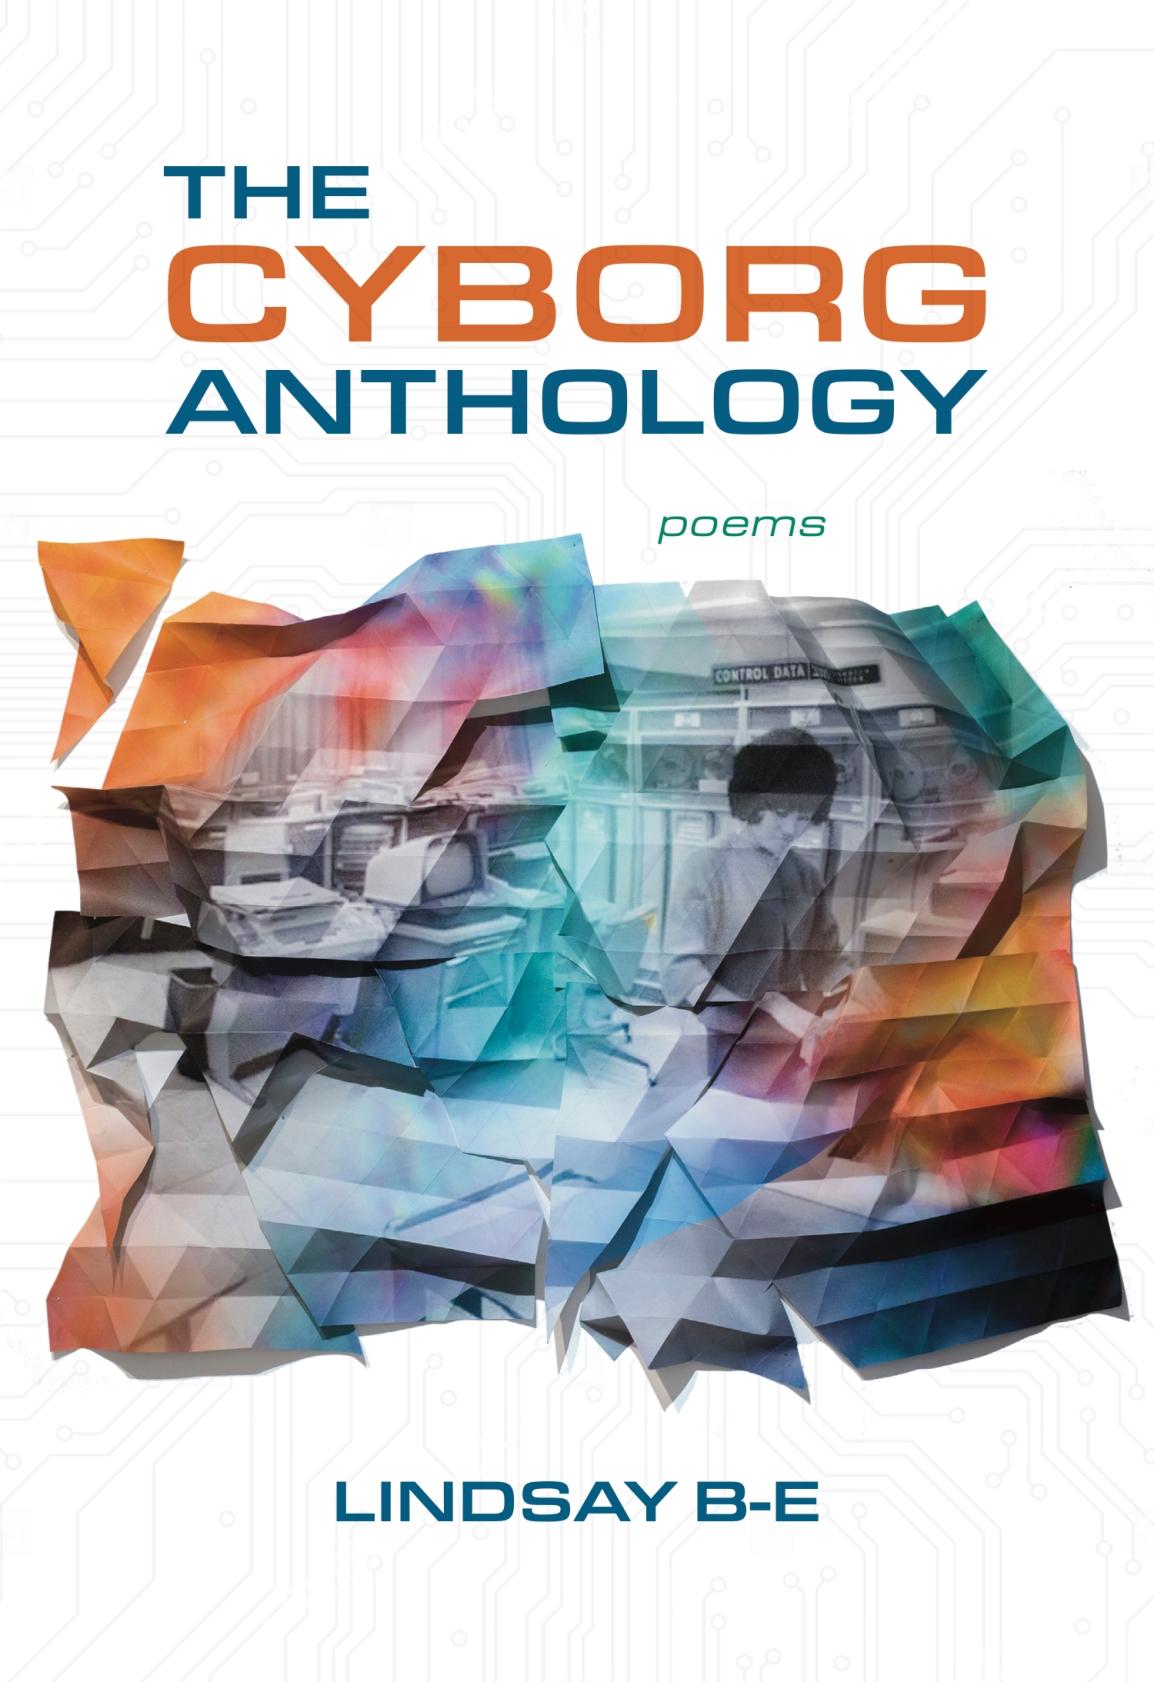 The Cyborg Anthology Trailer,Launch